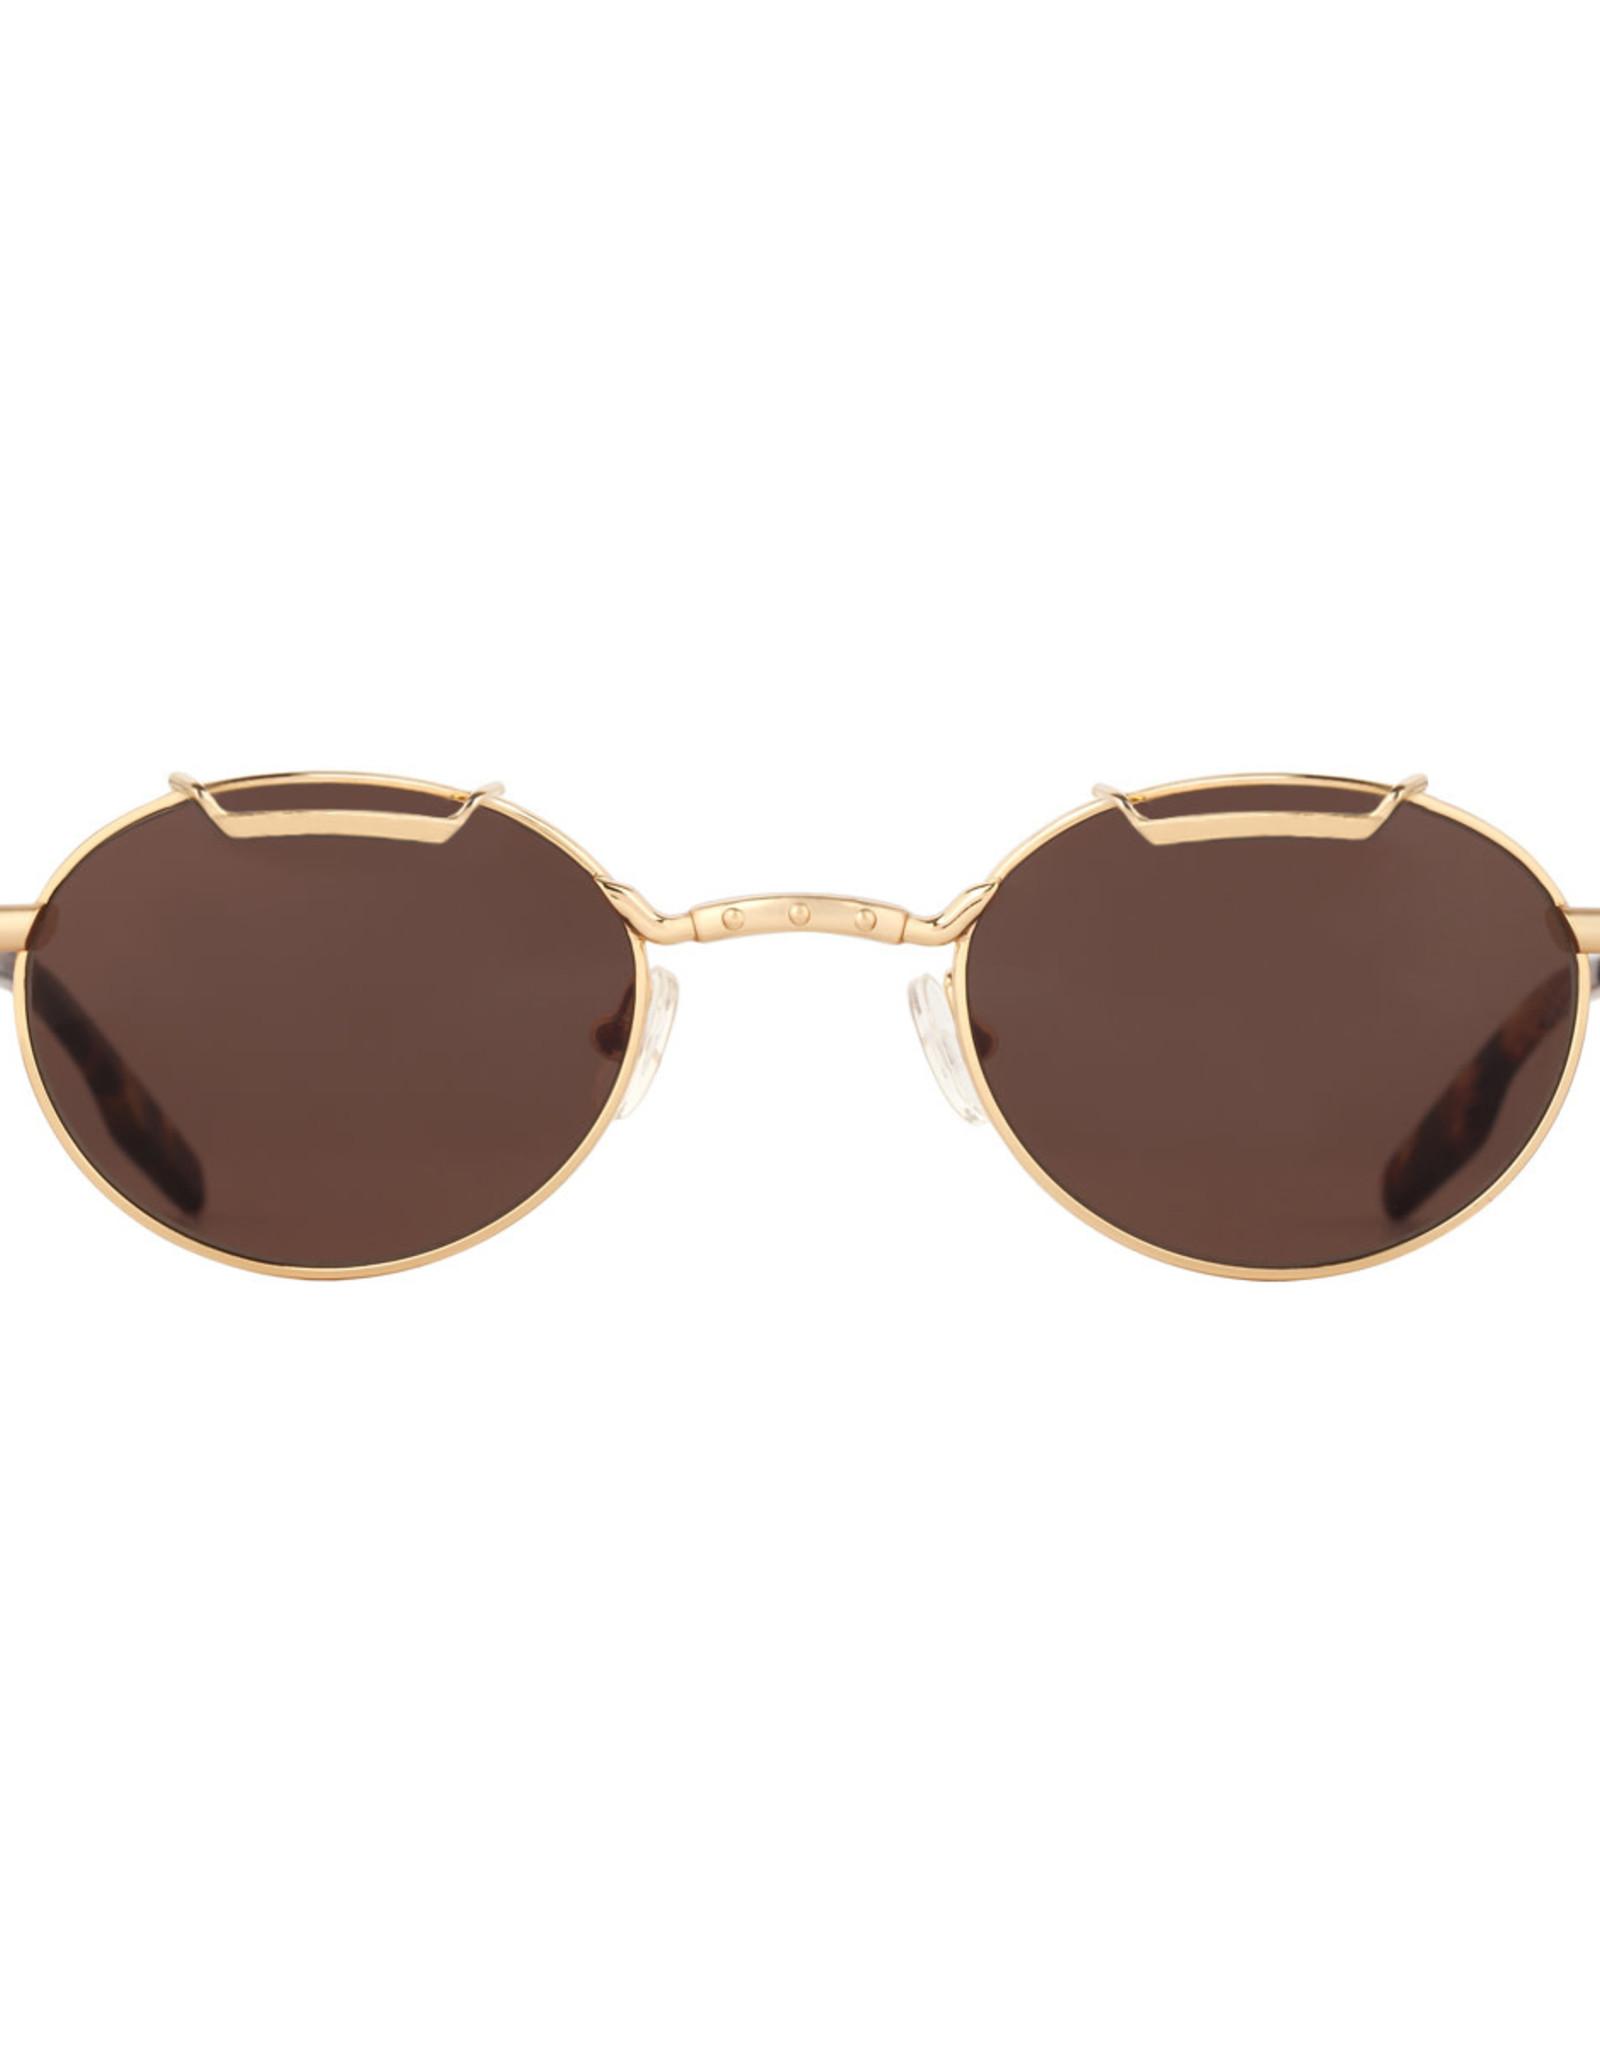 Amber Sceats Joey Sunglasses Gold/Brown